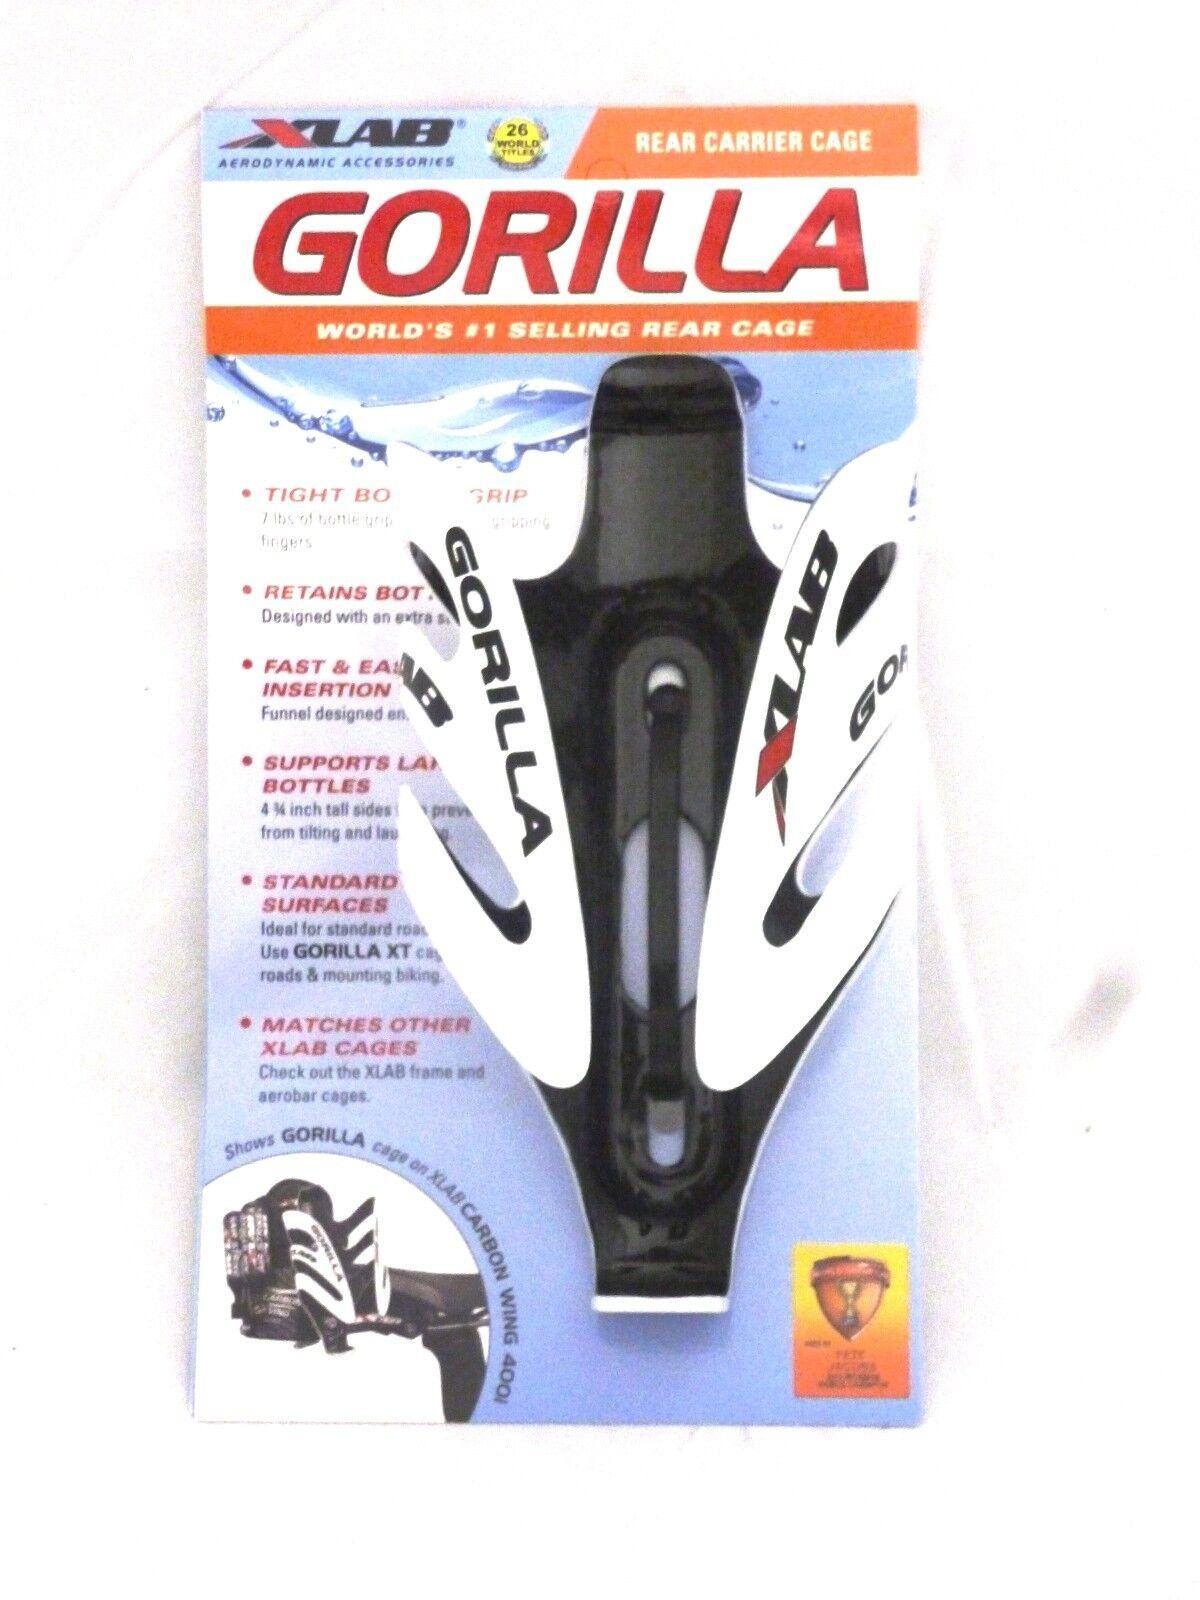 XLab Gorilla Carbon Cage bianca Xlab Gorilla Cage